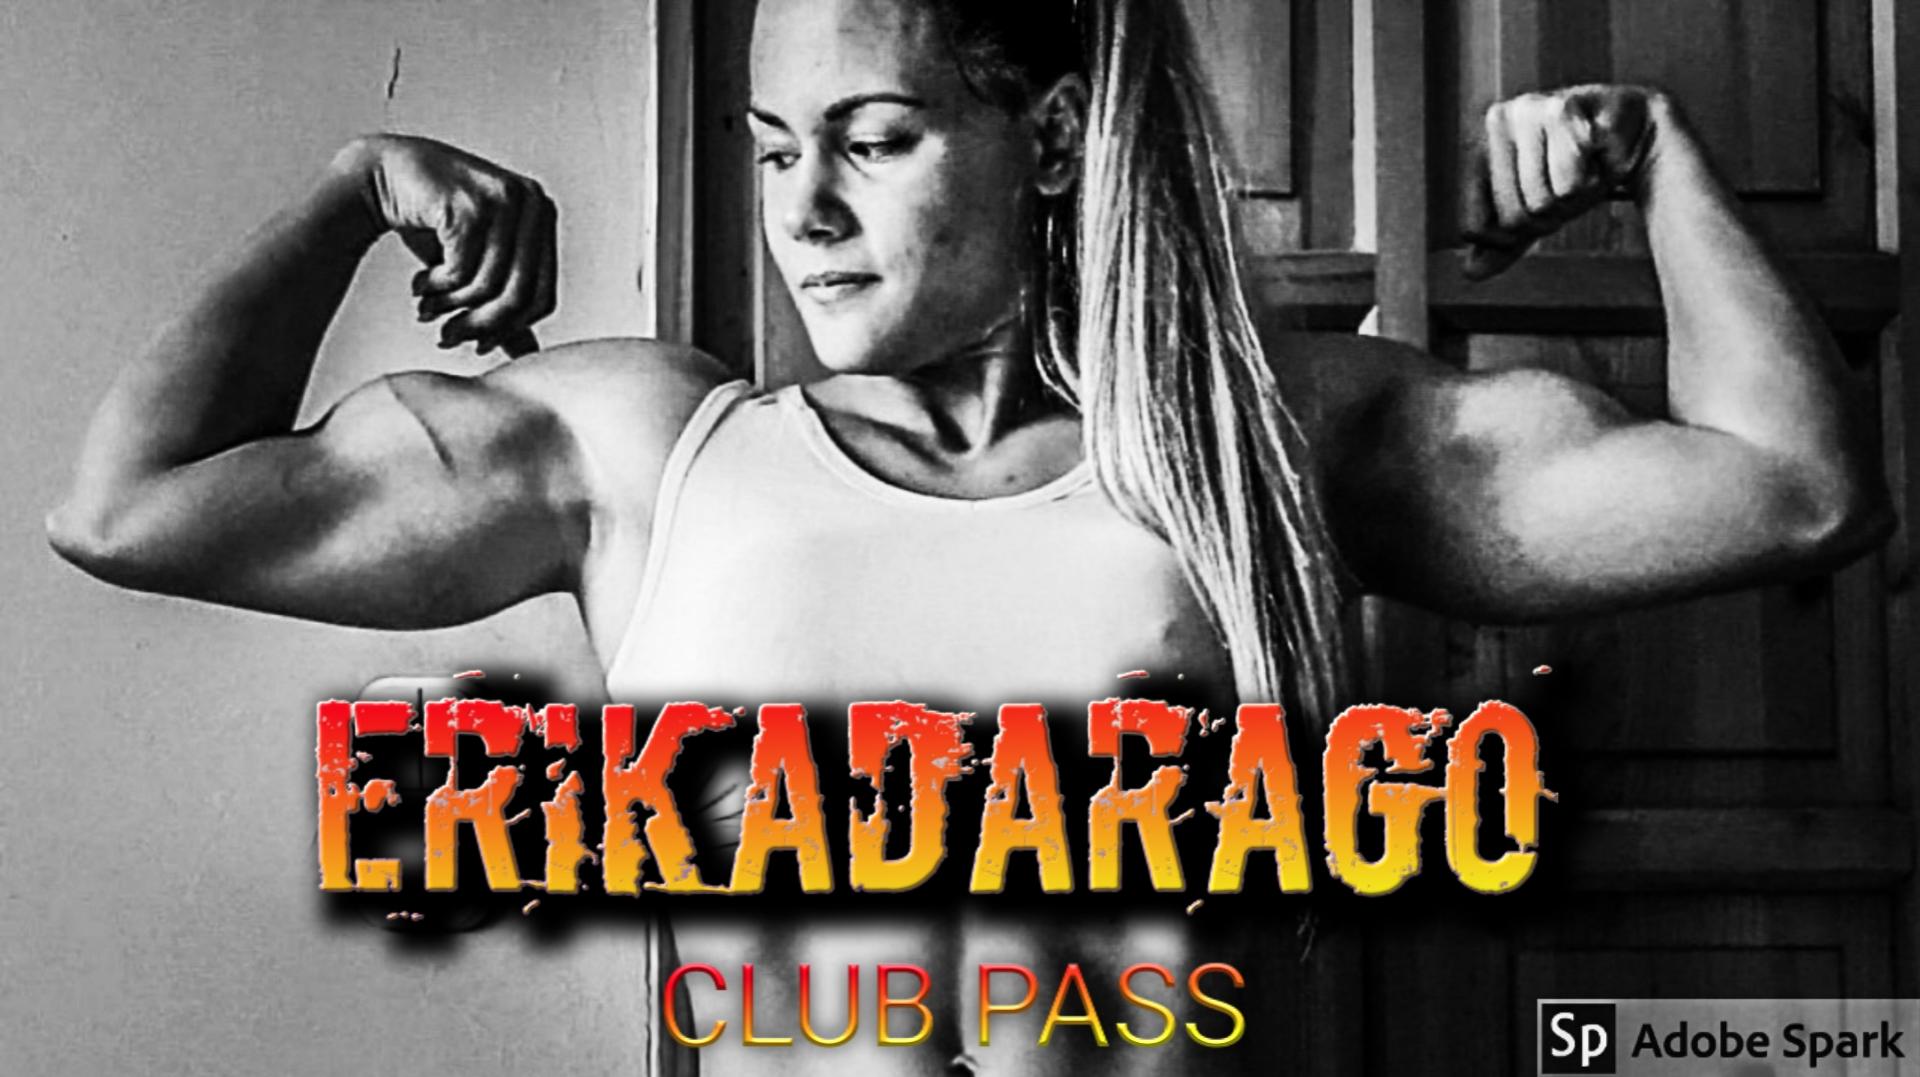 Erikadarago Club Pass